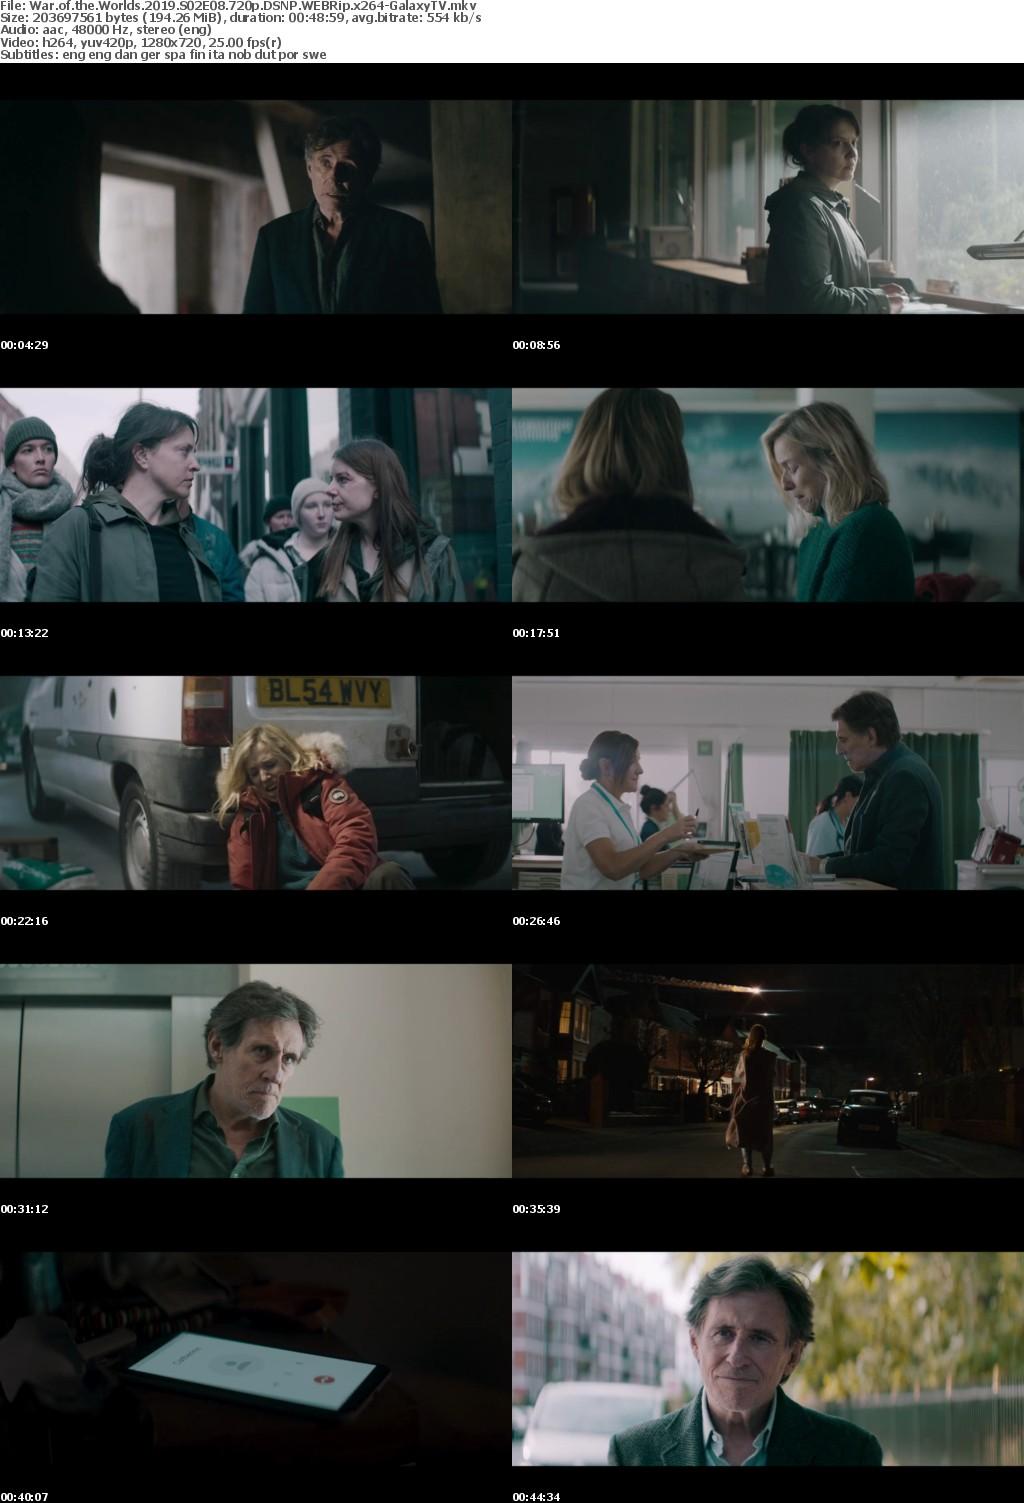 War of the Worlds 2019 S02 COMPLETE 720p DSNP WEBRip x264-GalaxyTV